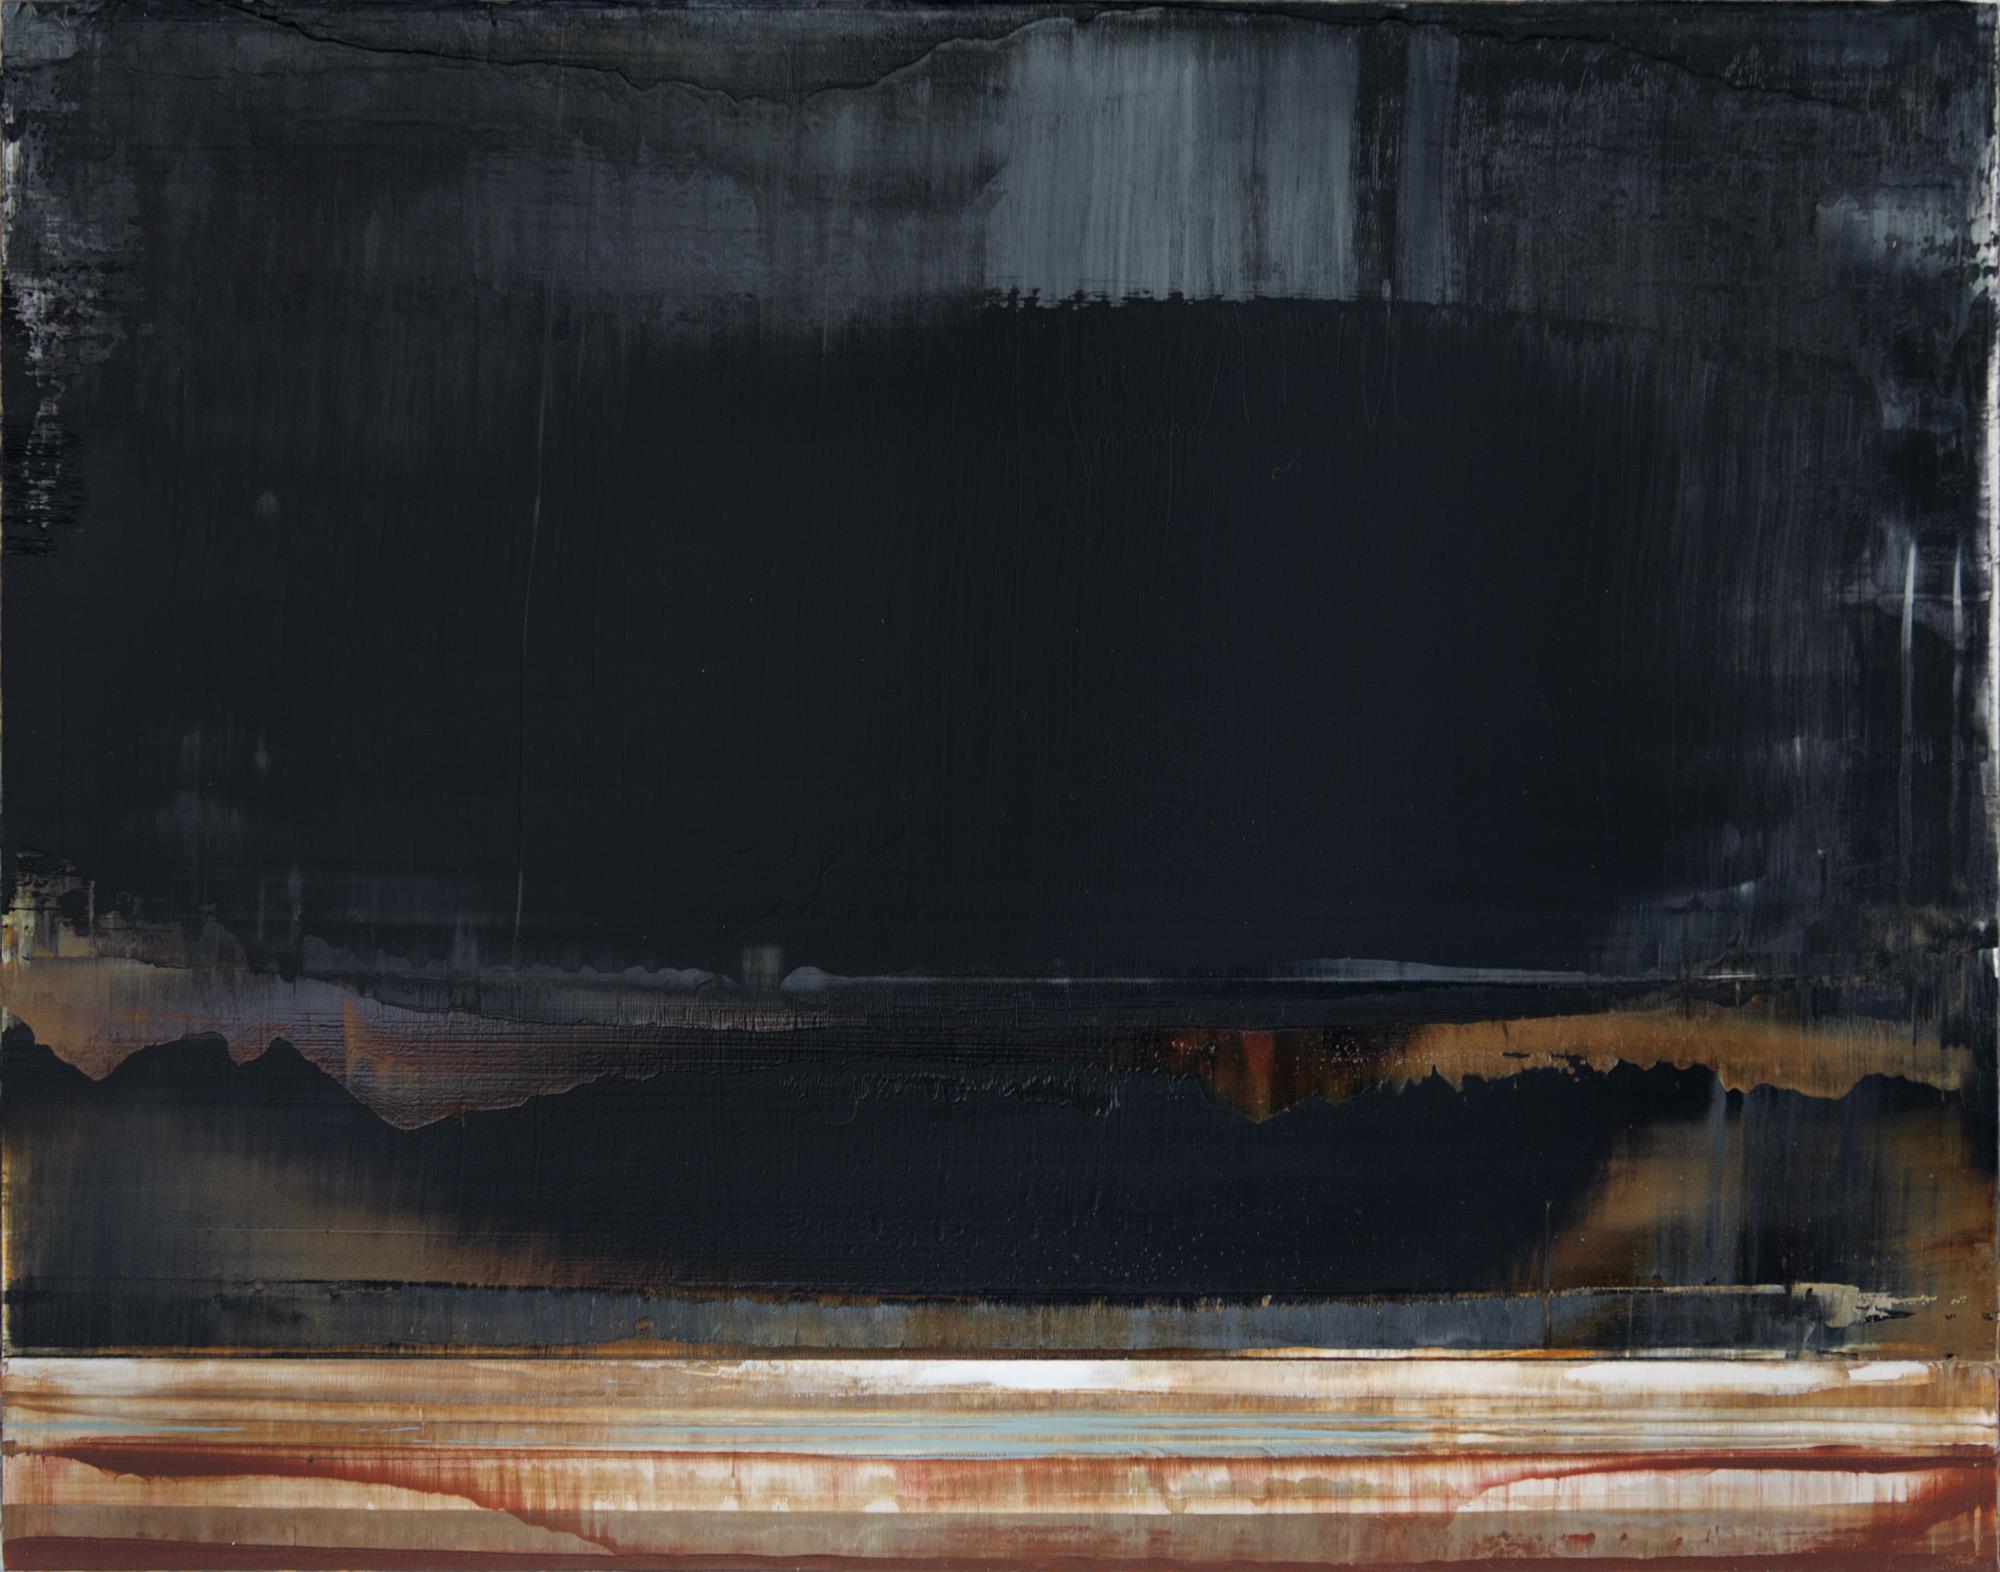 Abstract_Arif gift 28 x 35.5 cm.jpg